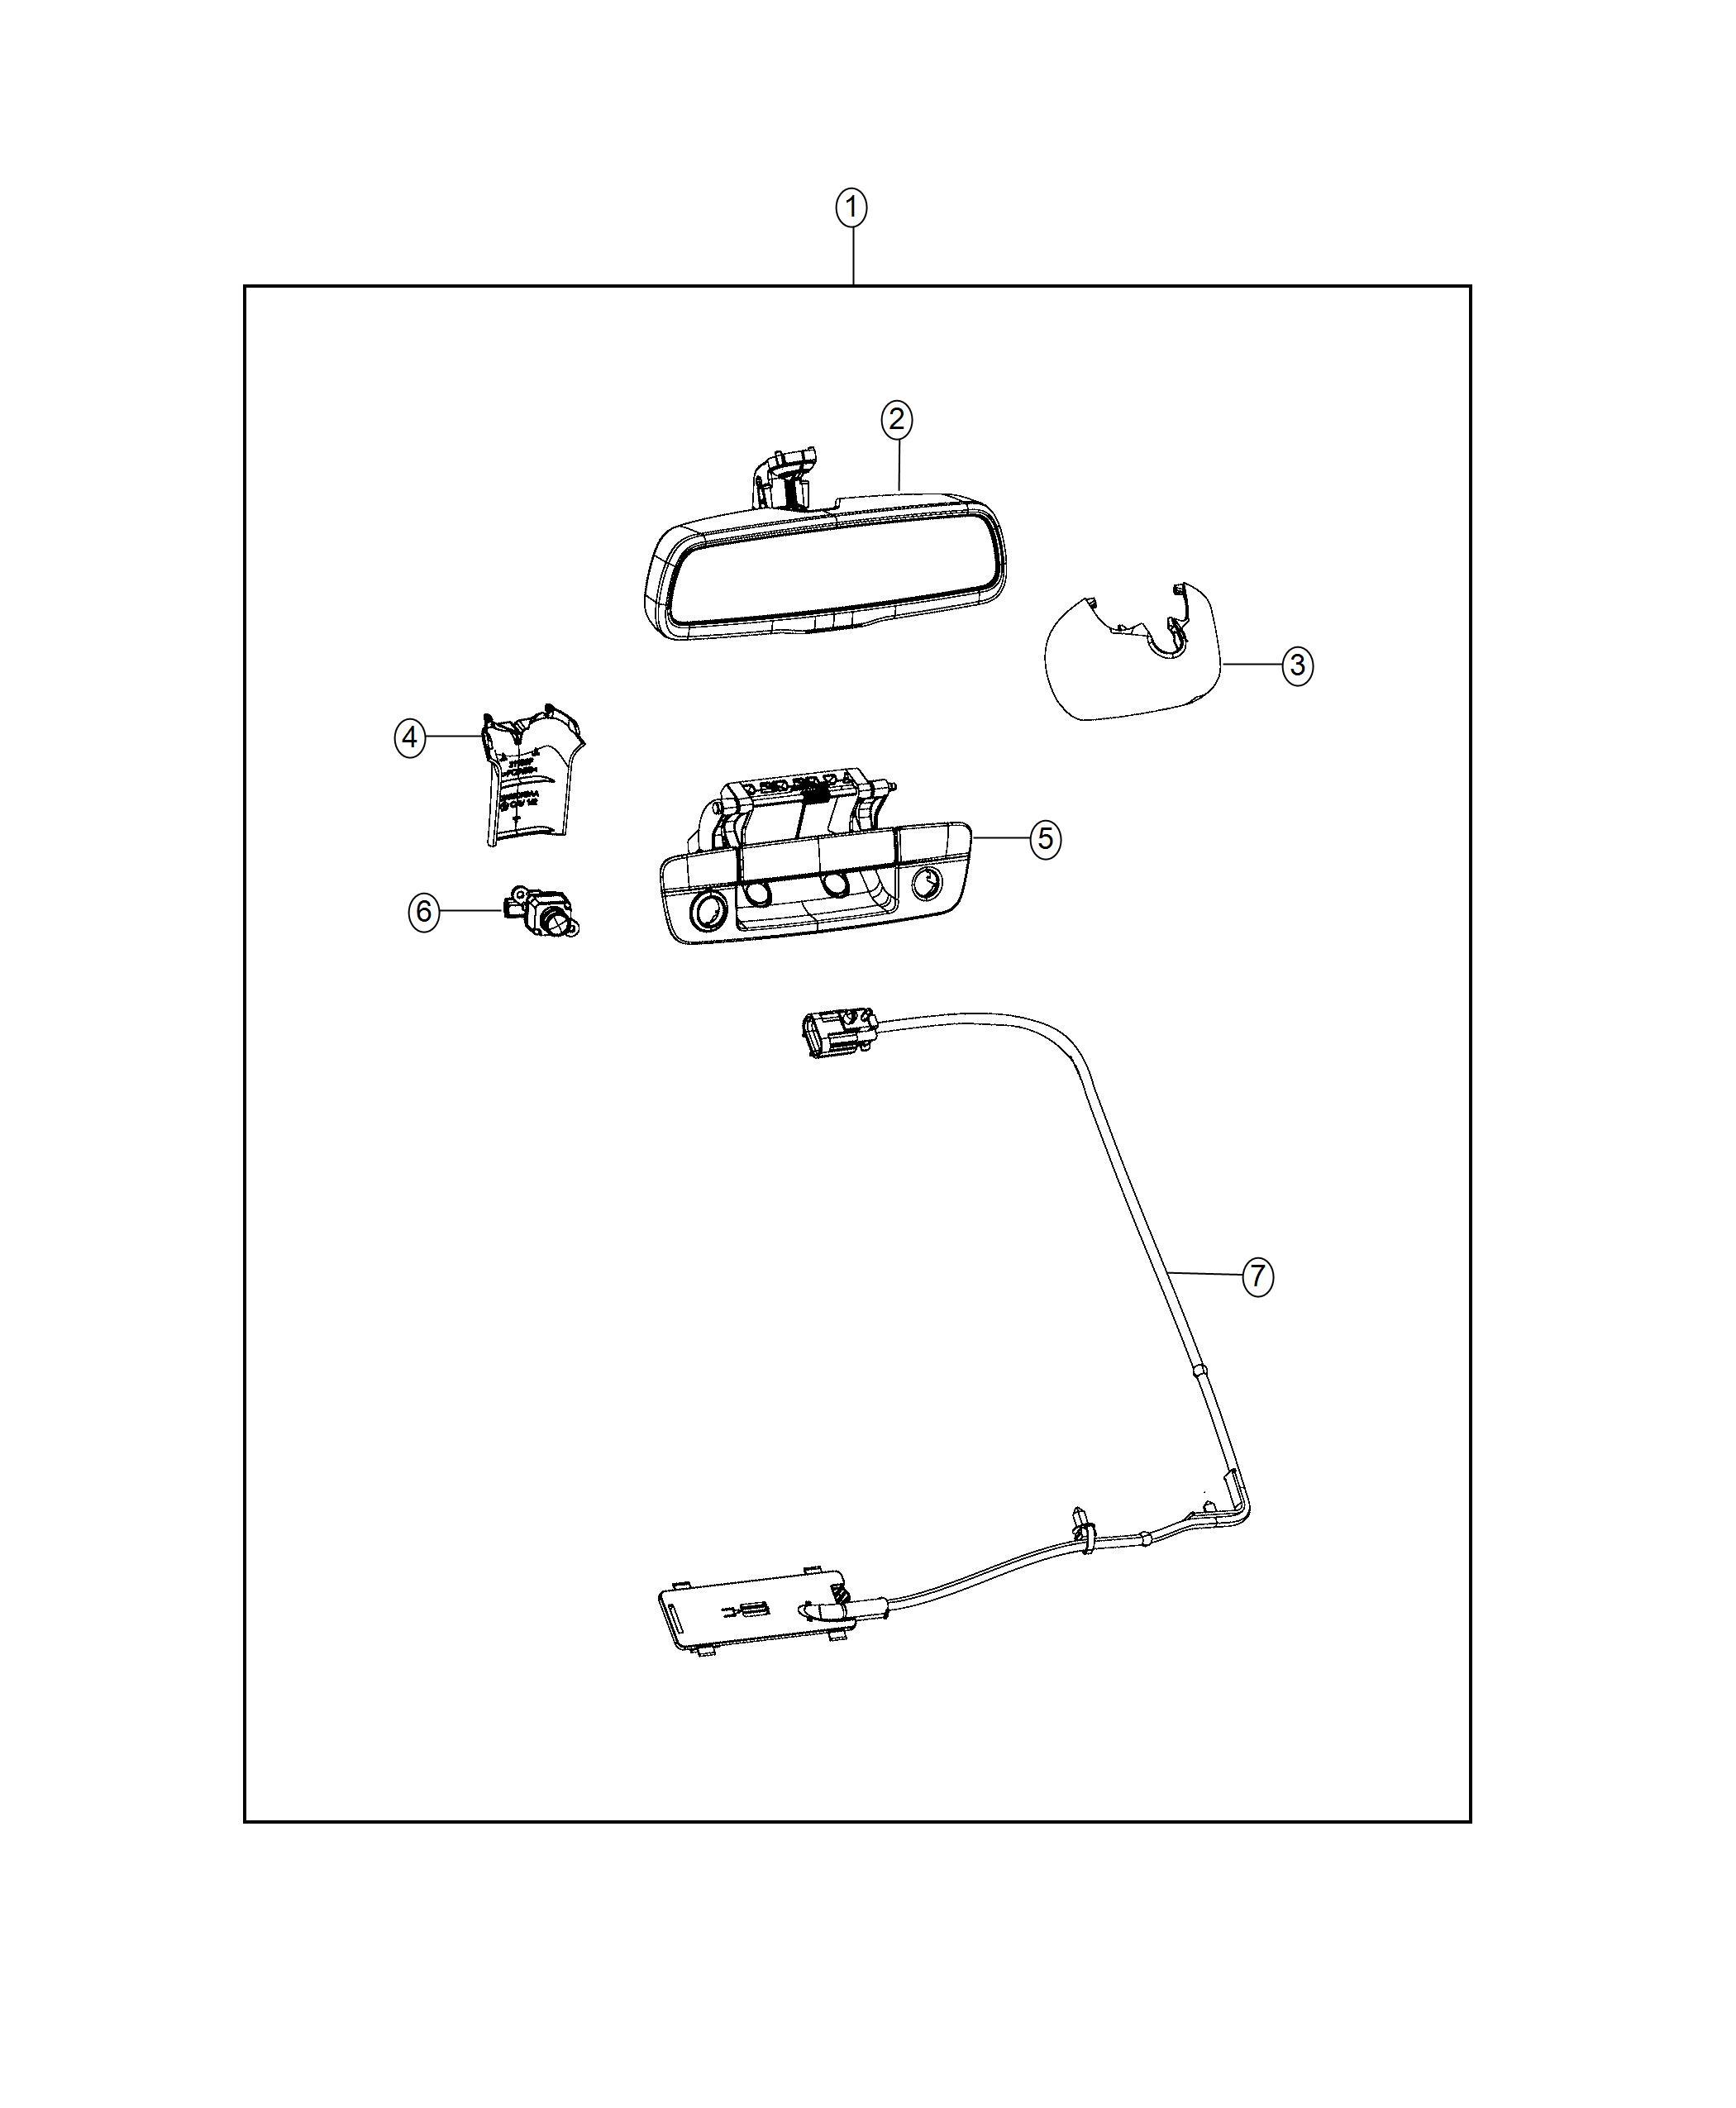 wiring diagram database  ram camera kit back up uconnect 3 0 am fm